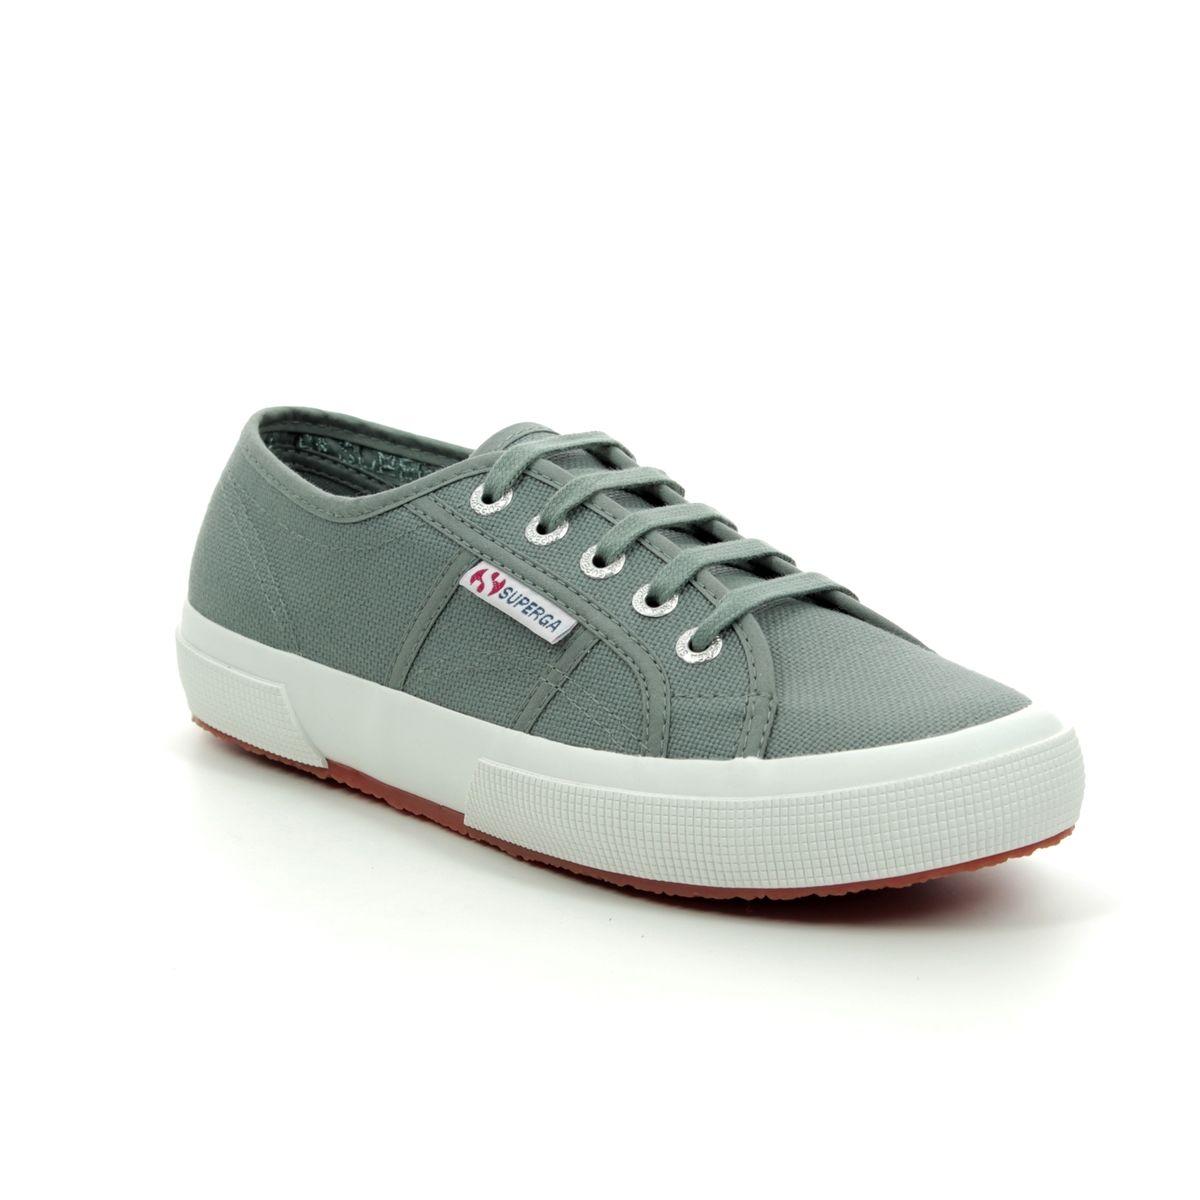 92f495a8e713 Superga Trainers - Grey - 2750 COTU Grey Sage S000010